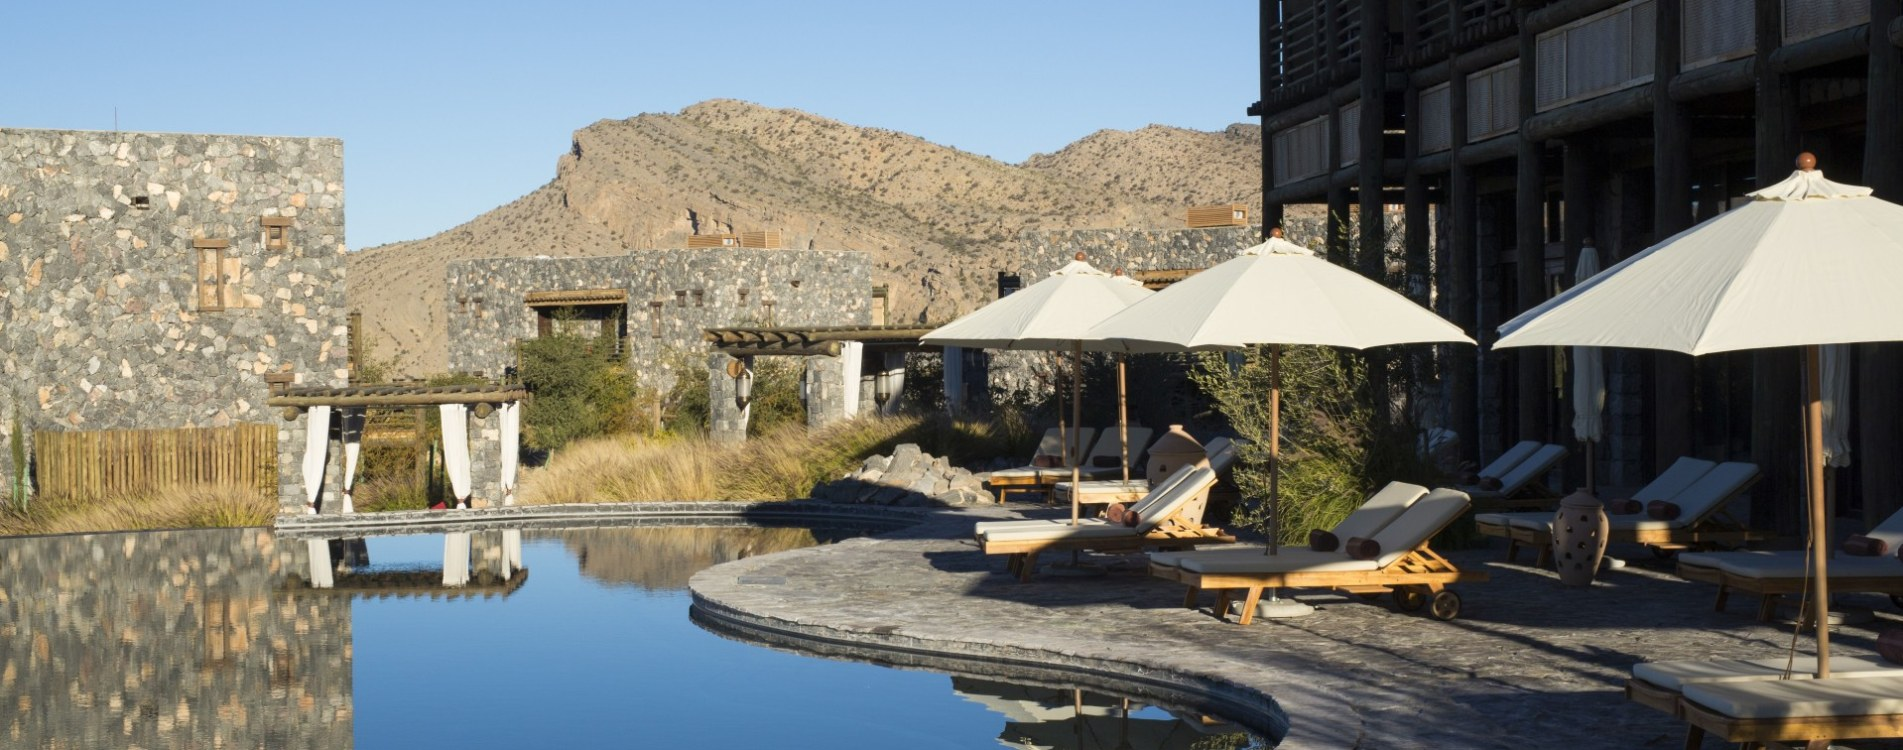 Alila-Jabal-Akhdar-Infinity-Pool-Exterior-Oman.JPG